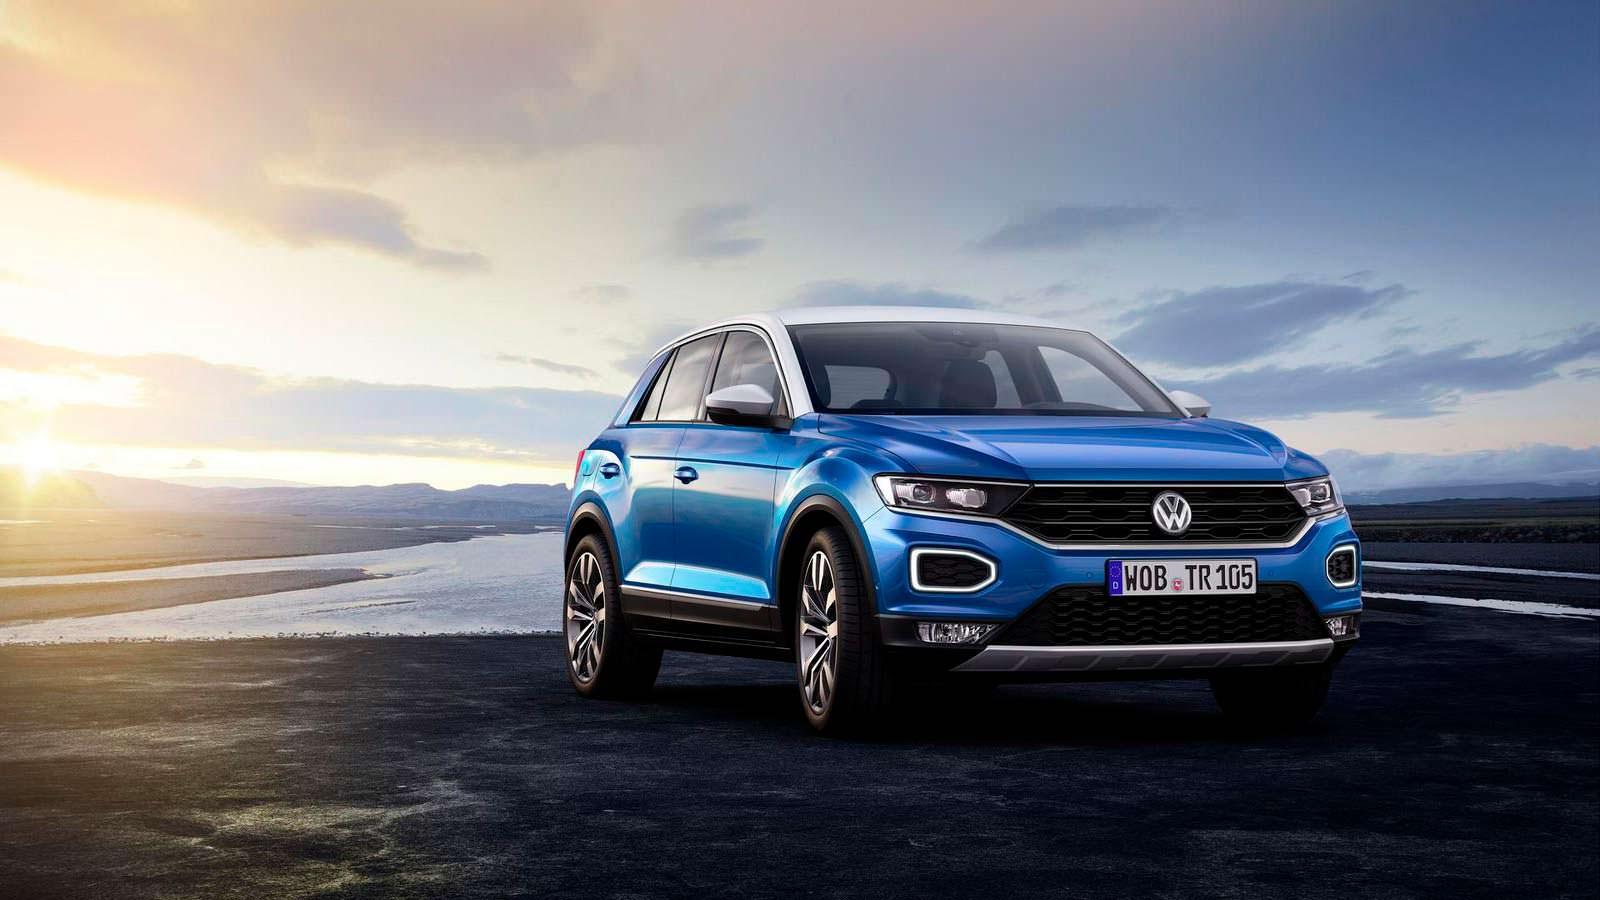 Фото | Кроссовер Volkswagen T-Roc